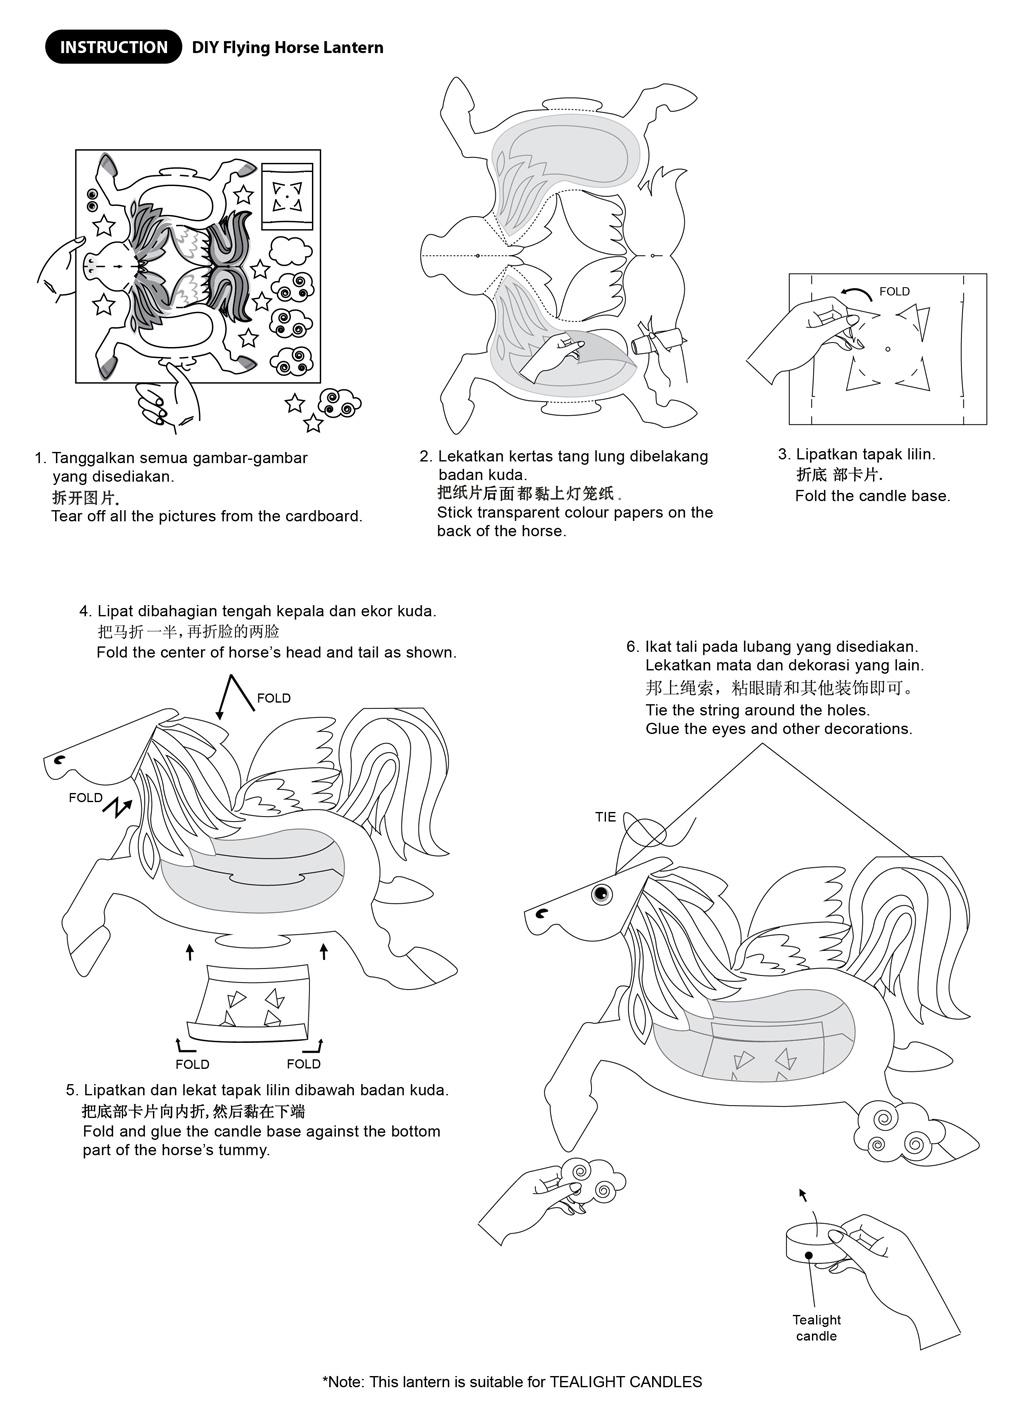 diy-flying-horse-lantern-sbs